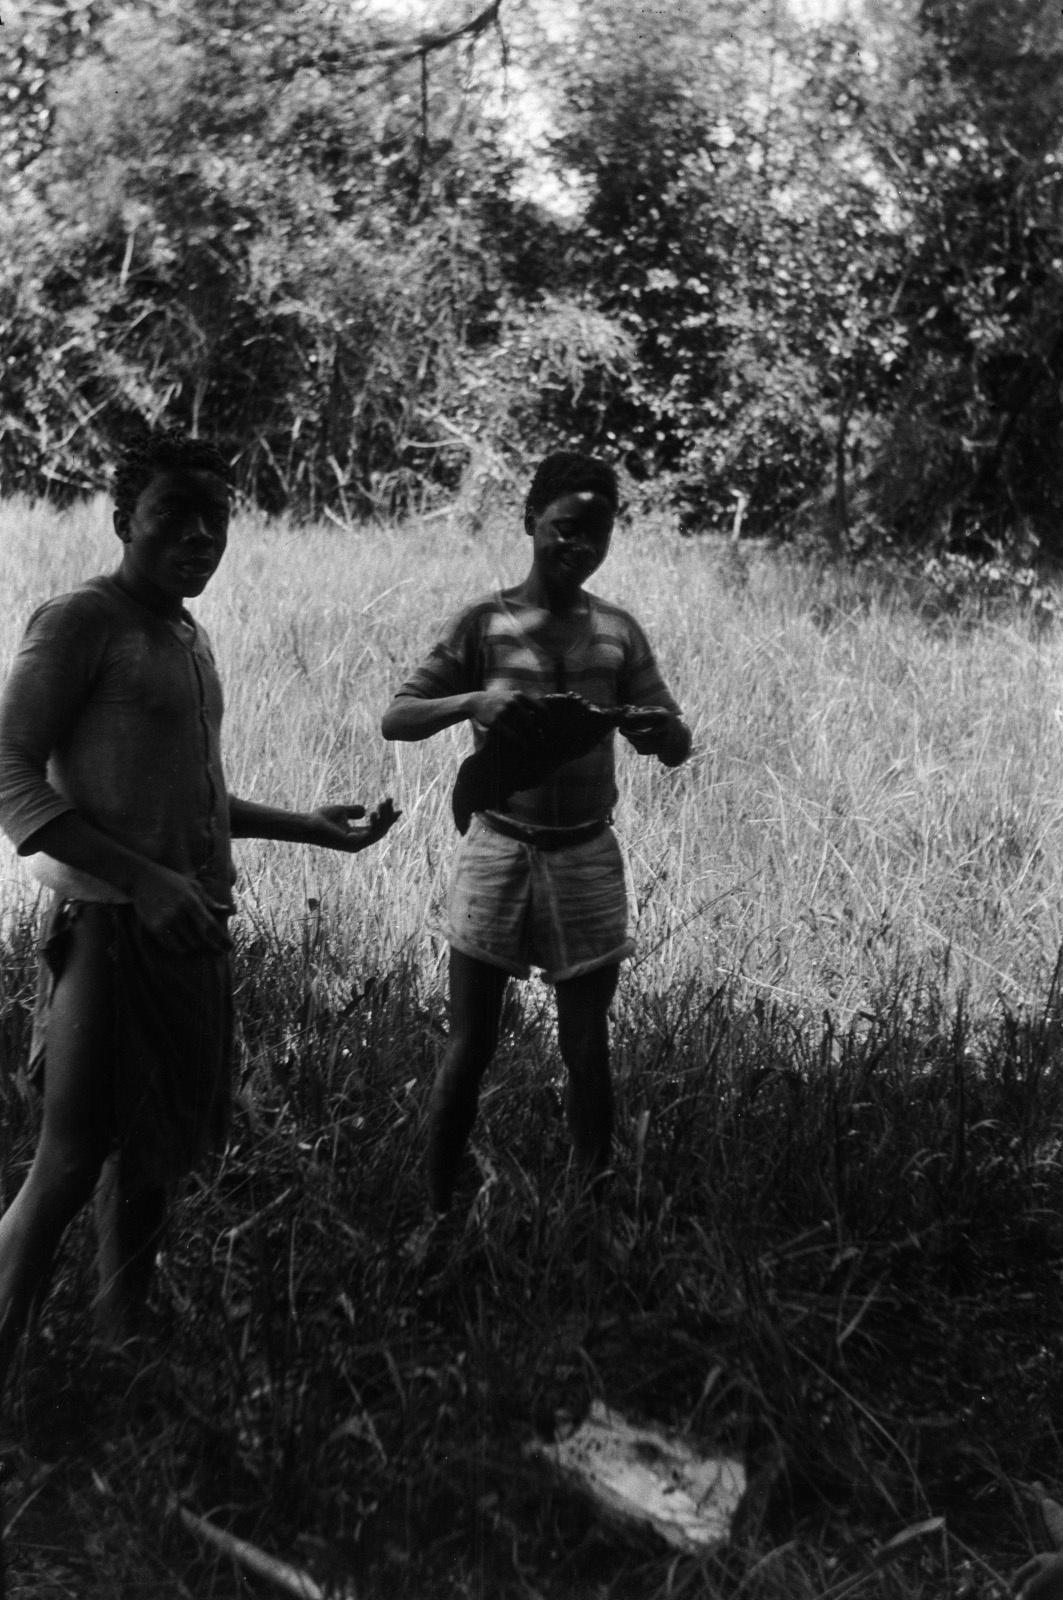 Н'Чанга. Два кальвеноса едят мед в тени дерева возле ручья